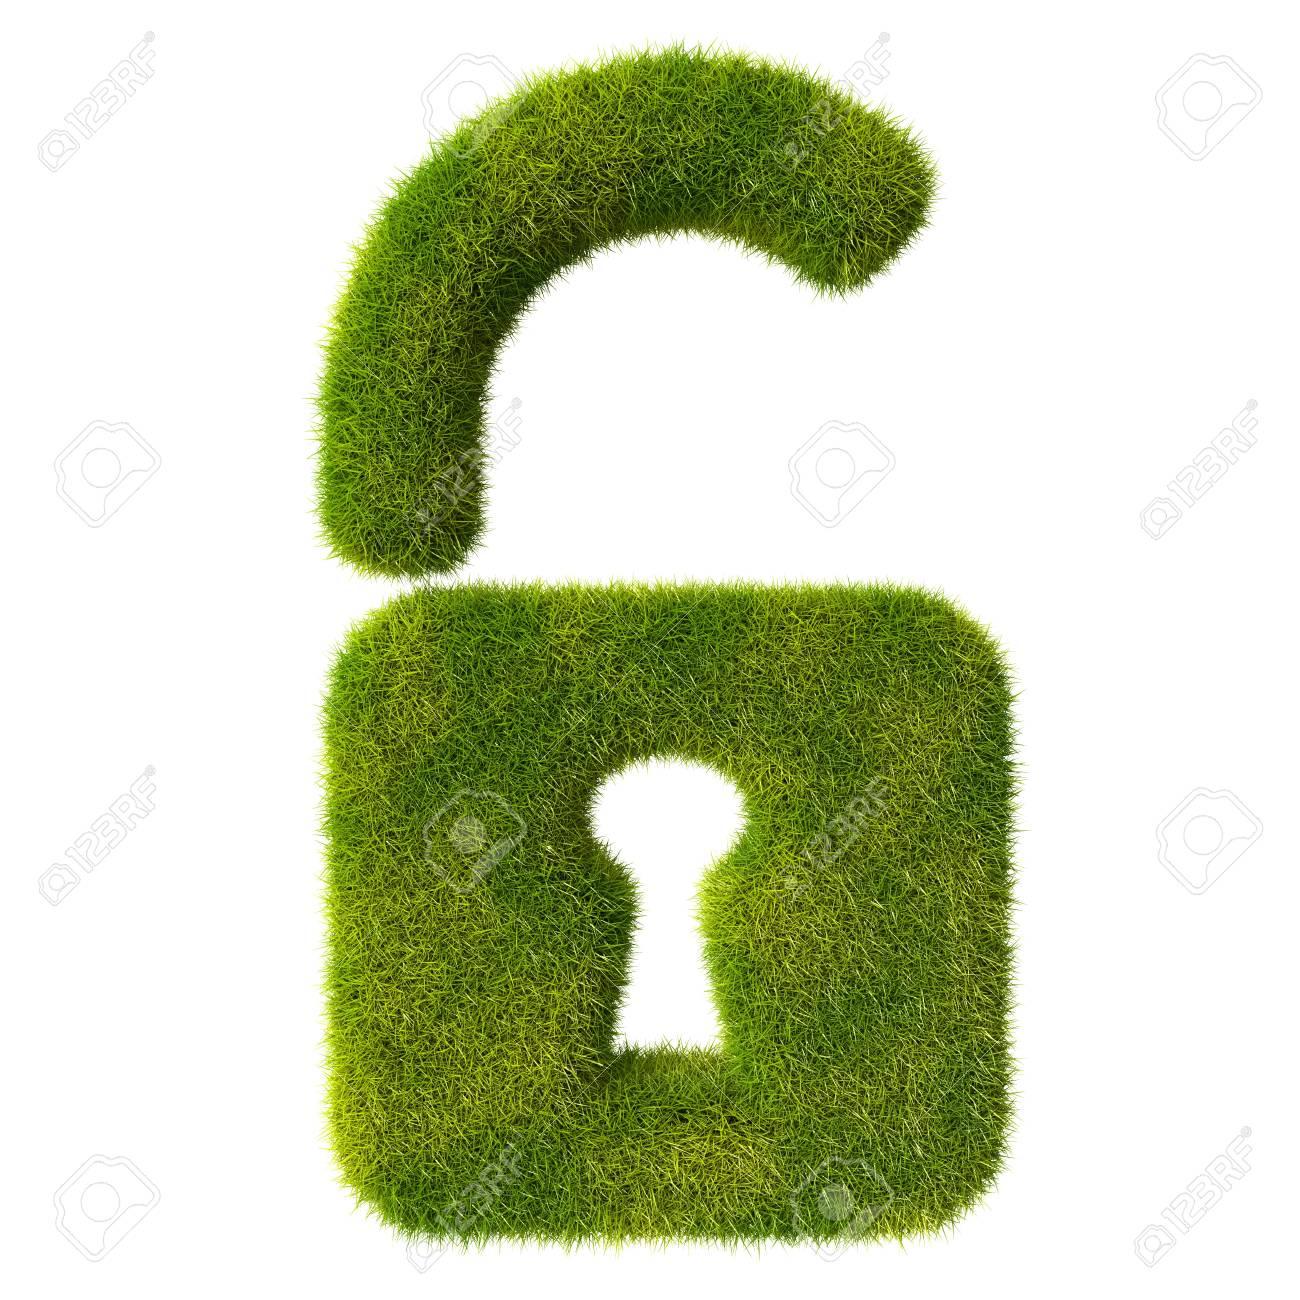 Grass unlocked lock icon Stock Photo - 19166629